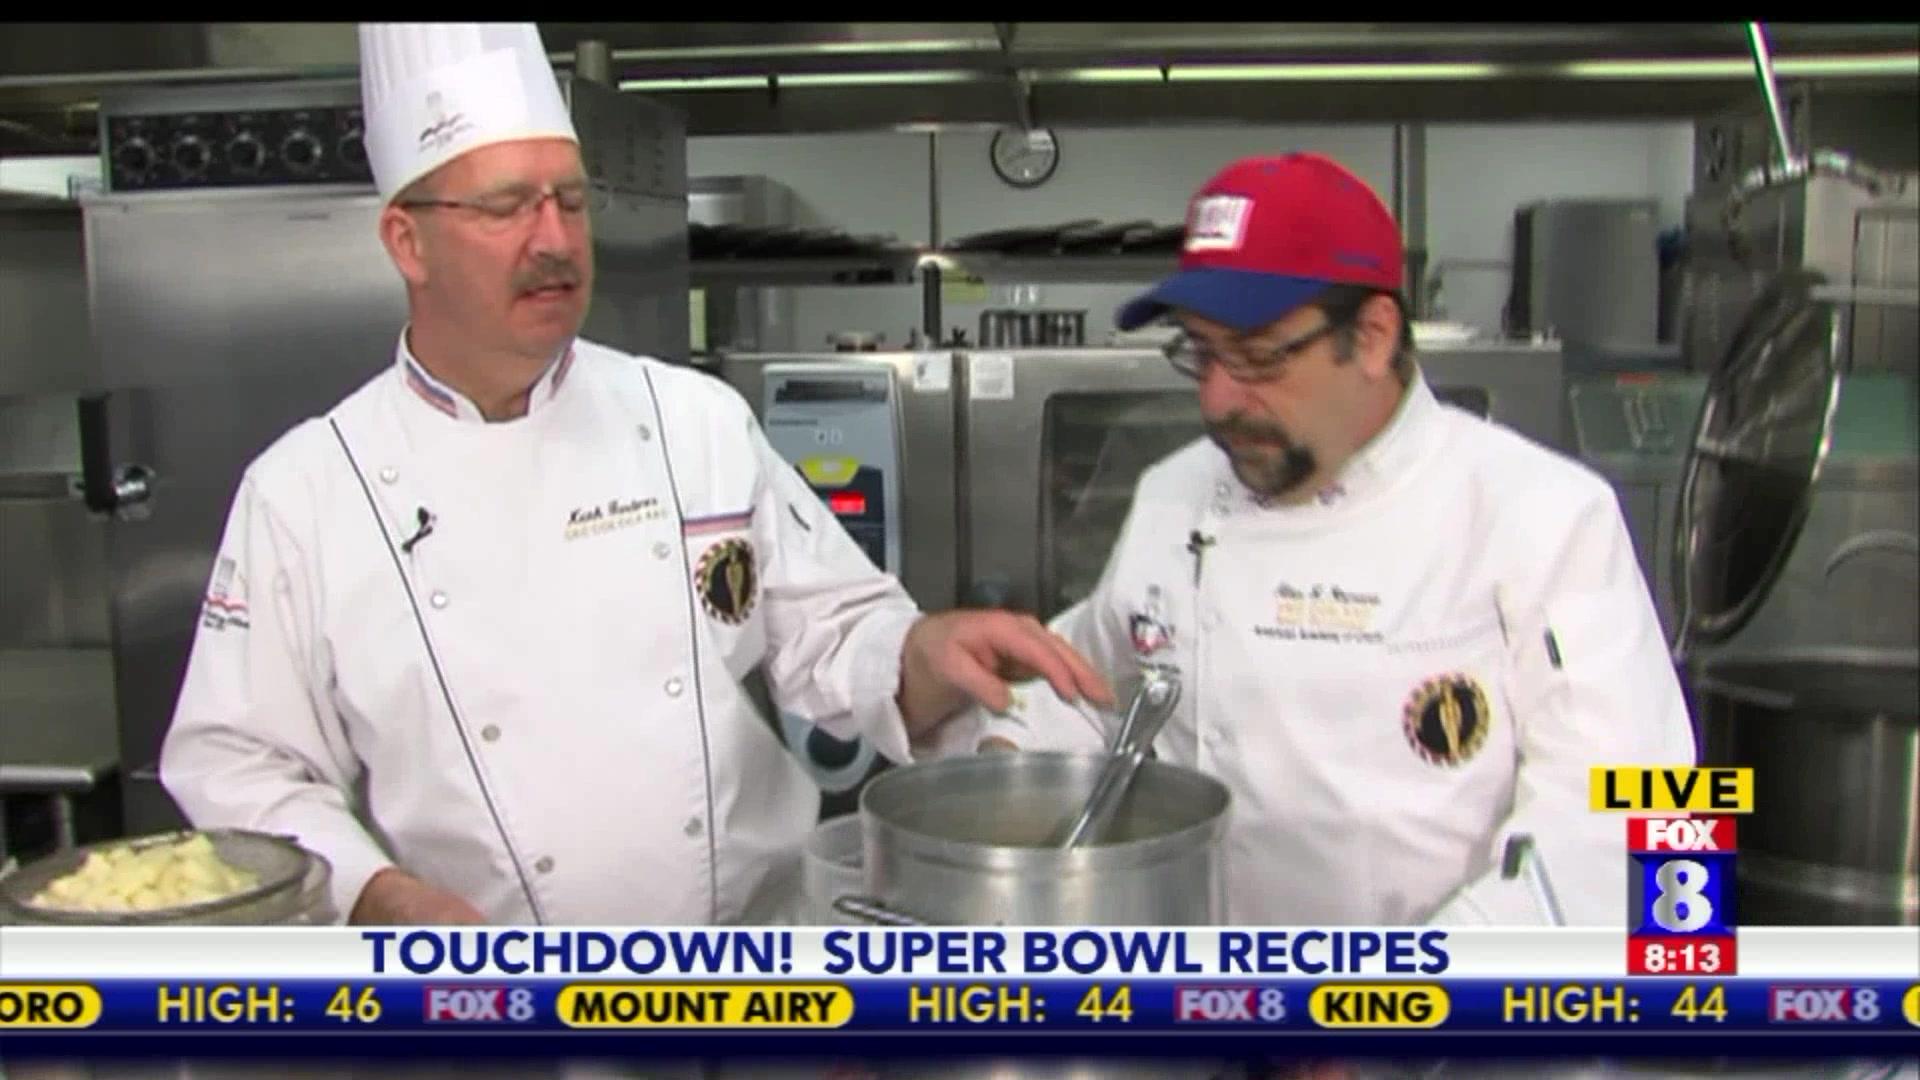 Clam Chowder Recipe Perfect for Super Bowl Sunday